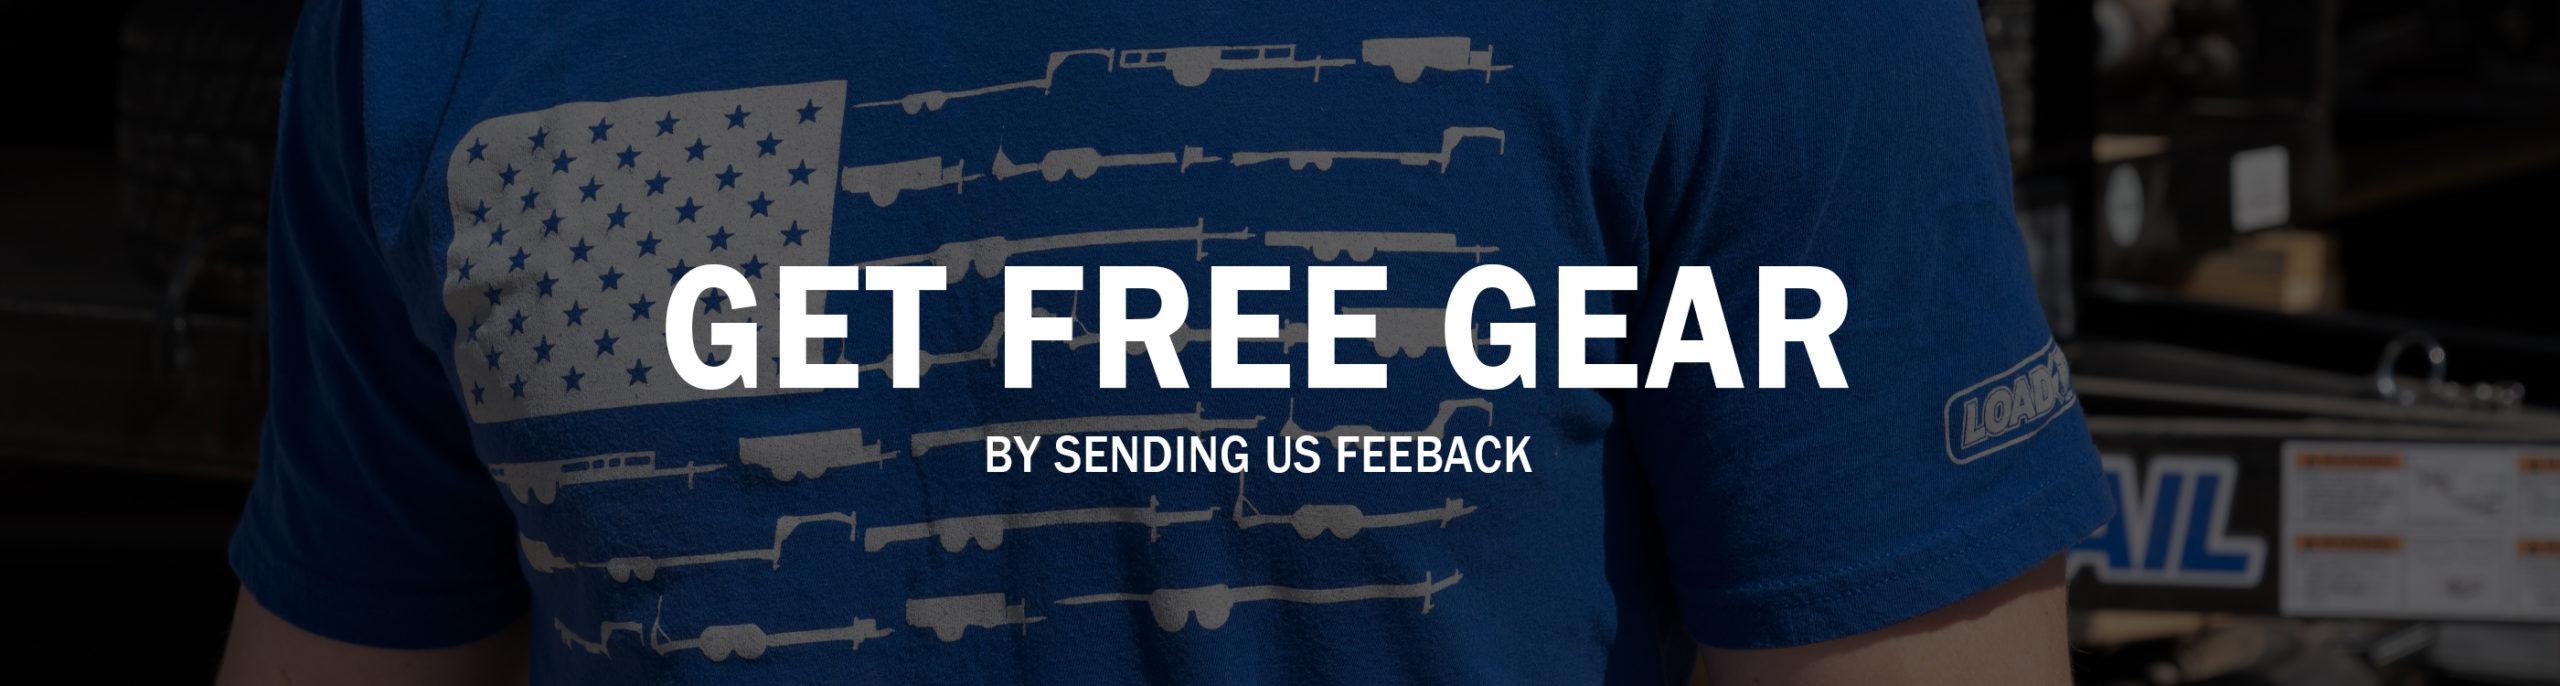 get free gear